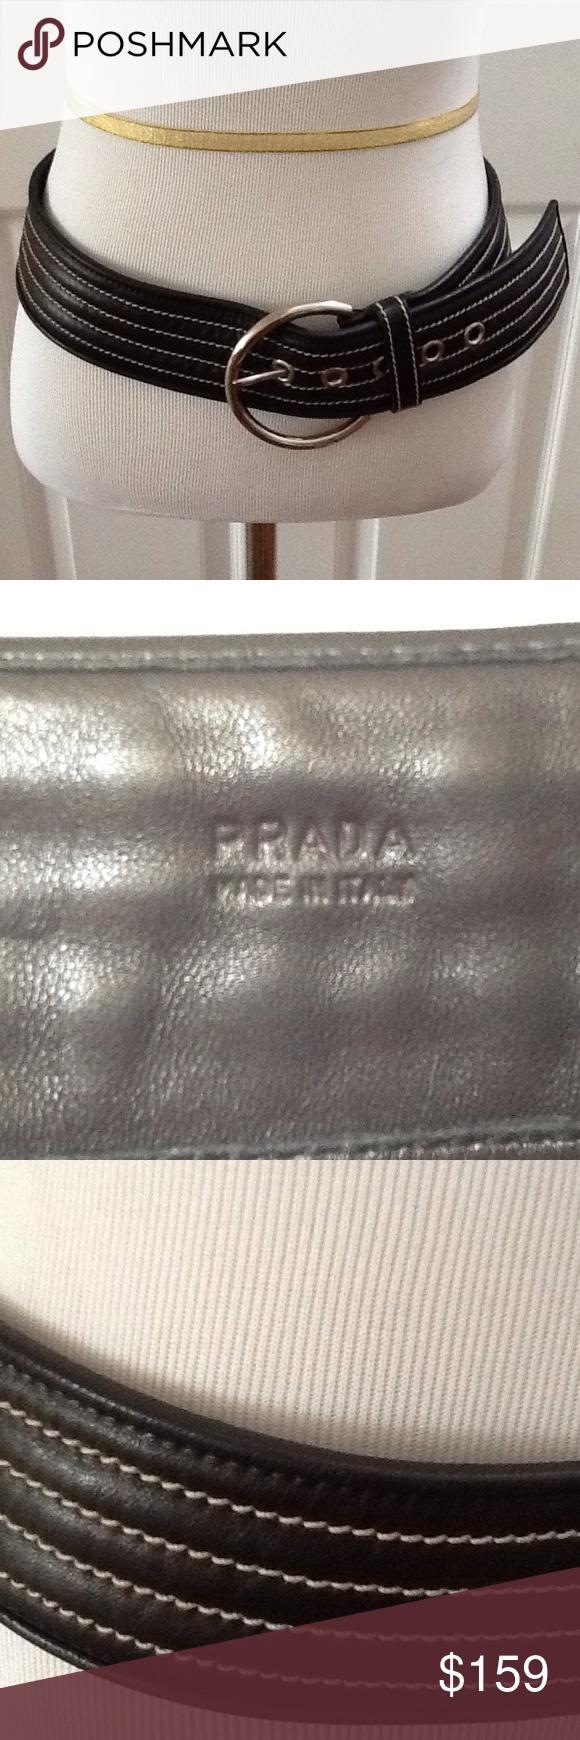 Prada Black Lamb Skin Leather Belt Prada Black Lamb Skin Leather Belt Prada Accessories Belts